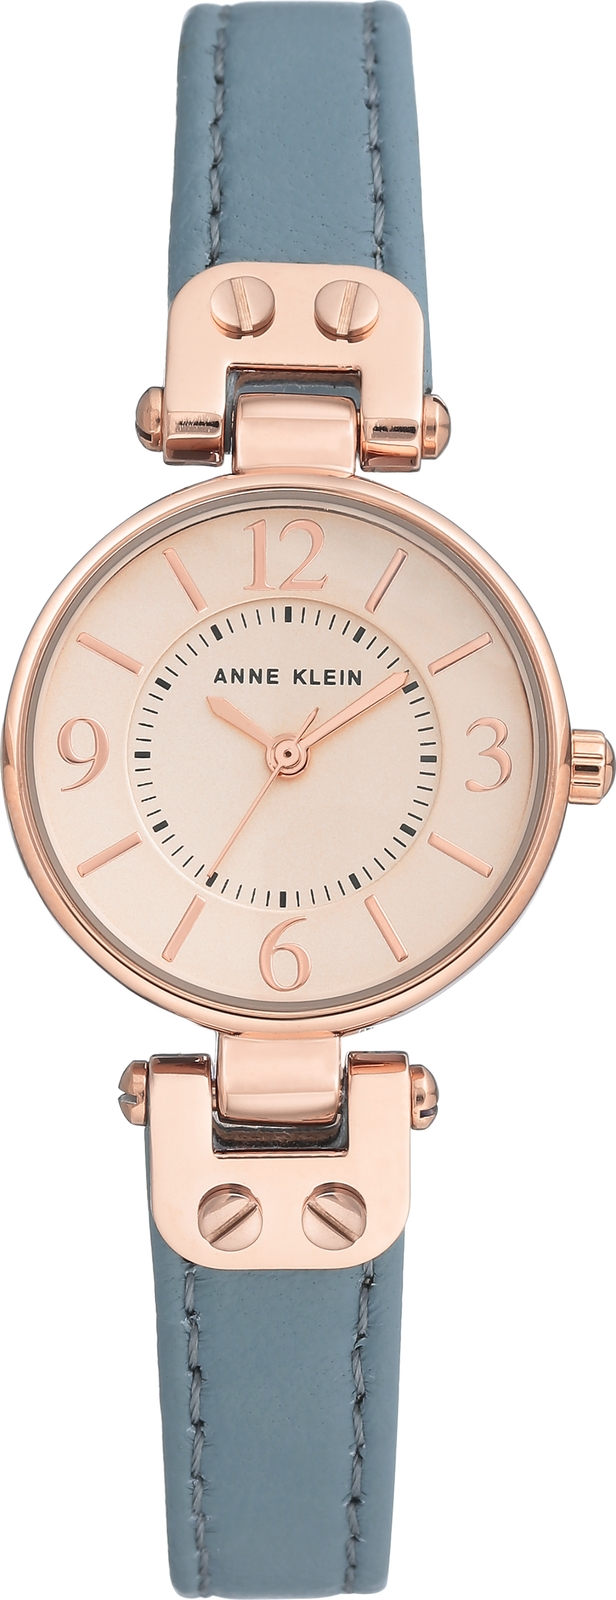 Наручные часы Anne Klein женские голубой ziiiro наручные часы ziiiro eclipse metalic rose gold